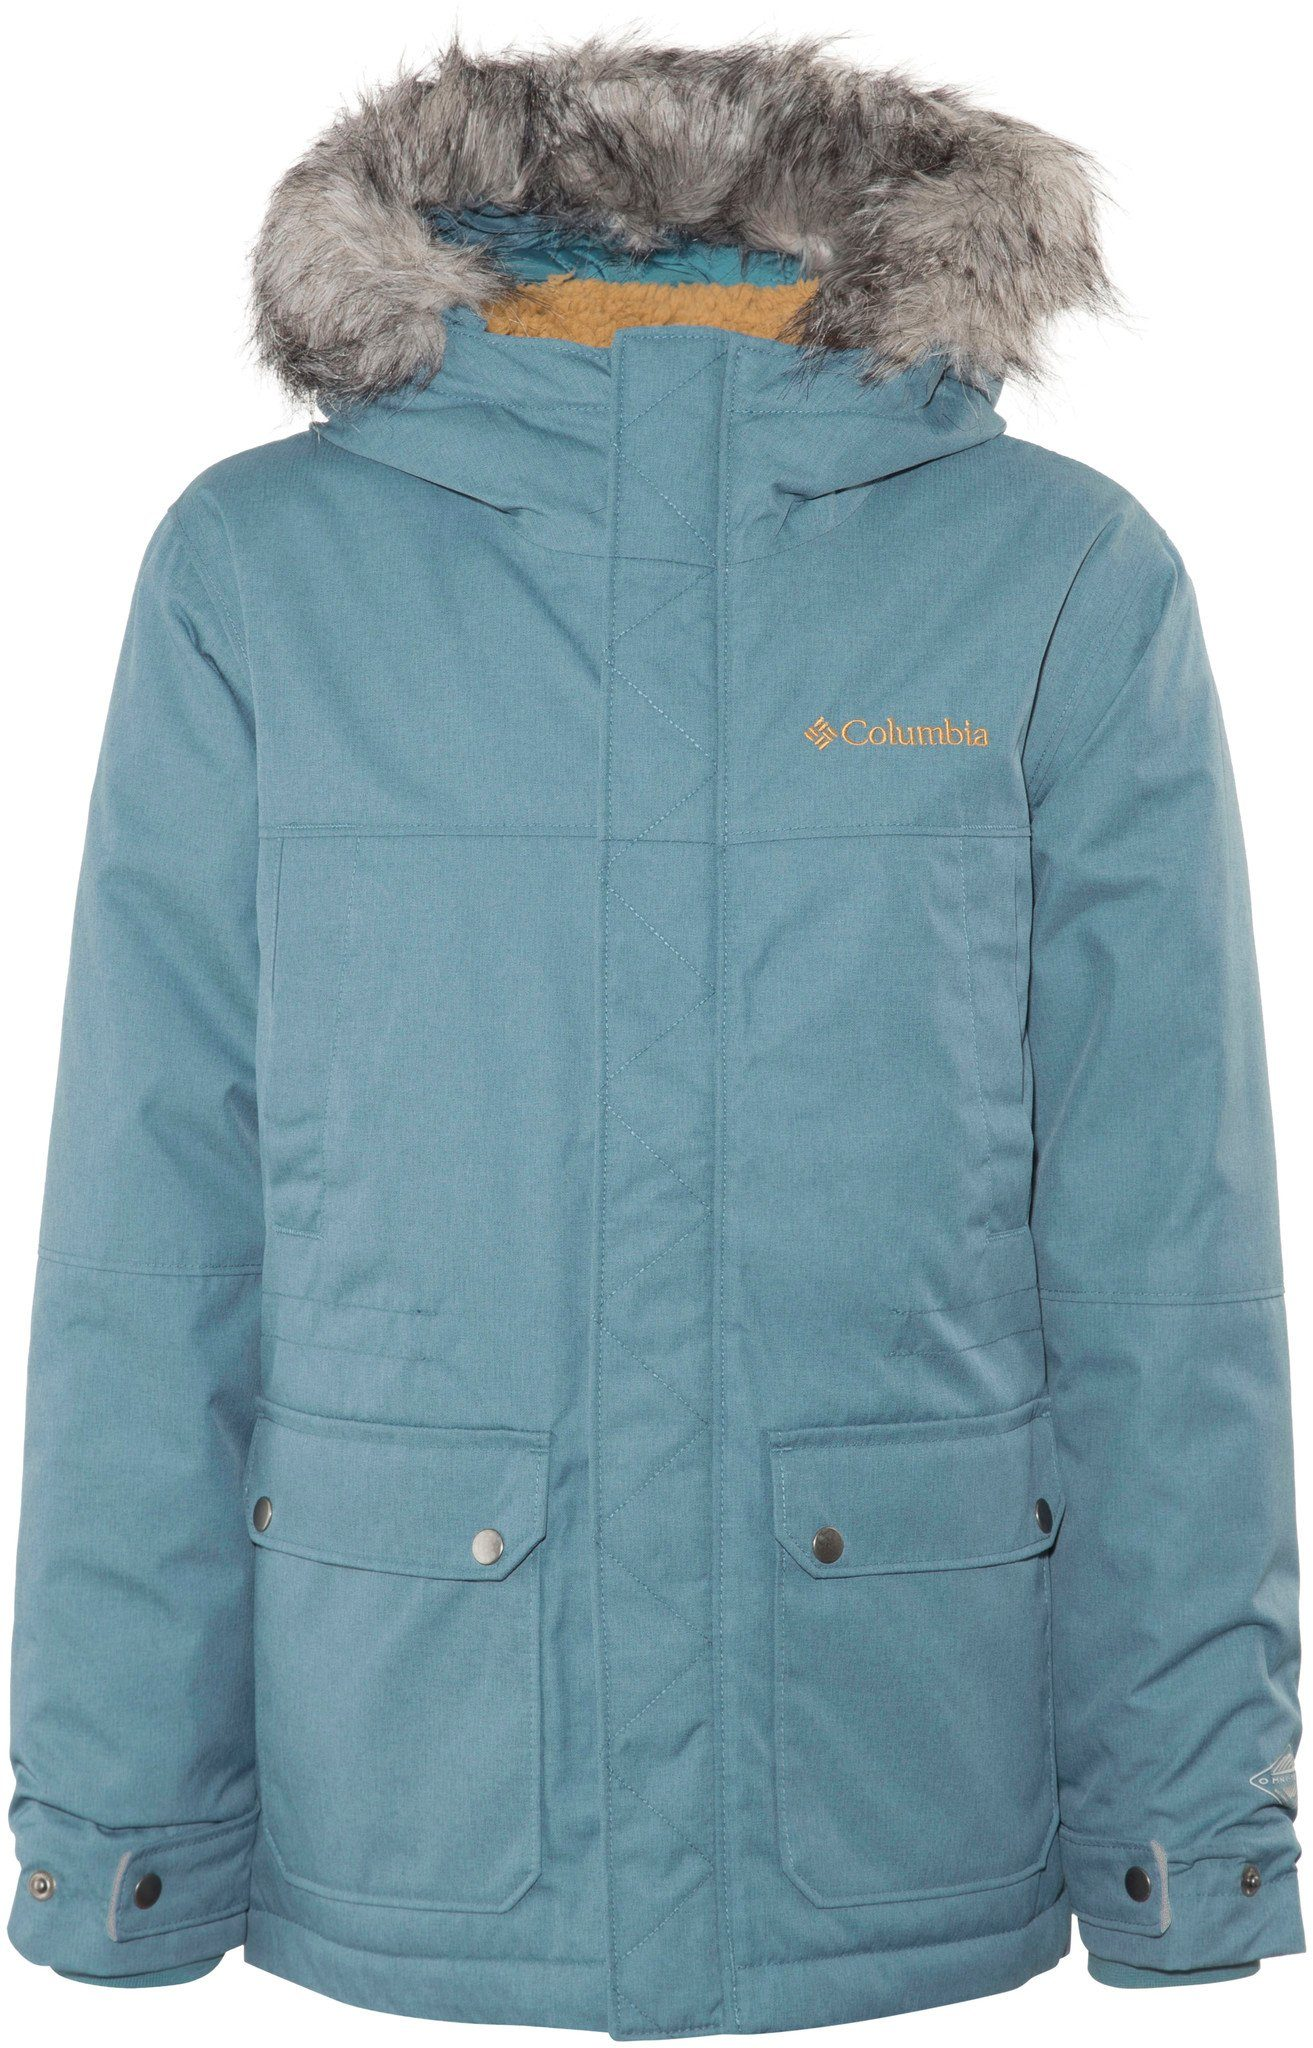 Columbia Outdoorjacke »Snowfield Jacket Boys«